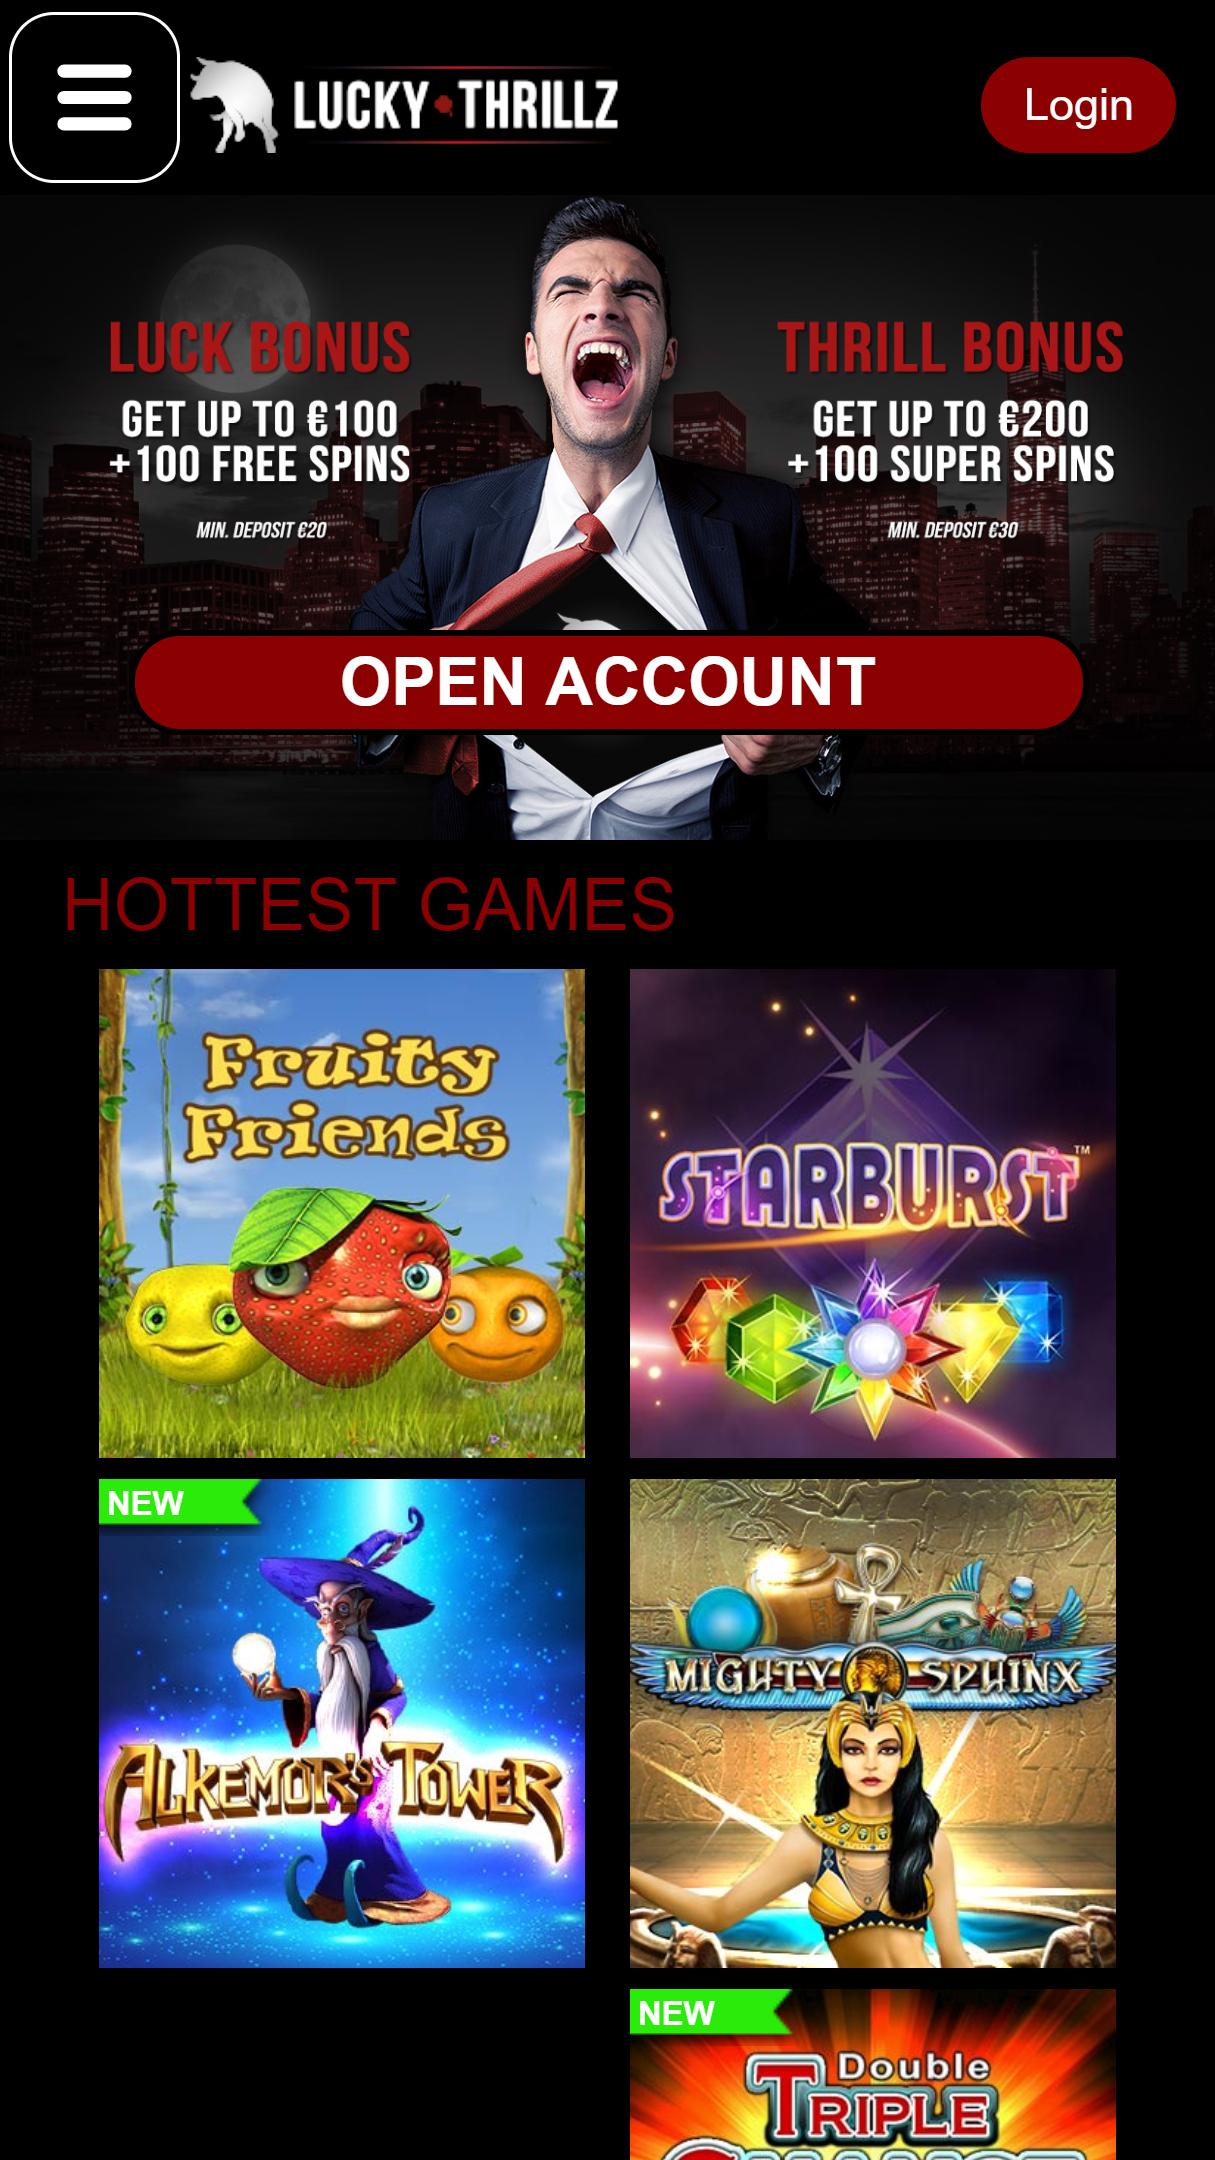 Lucky Thrillz App Homepage